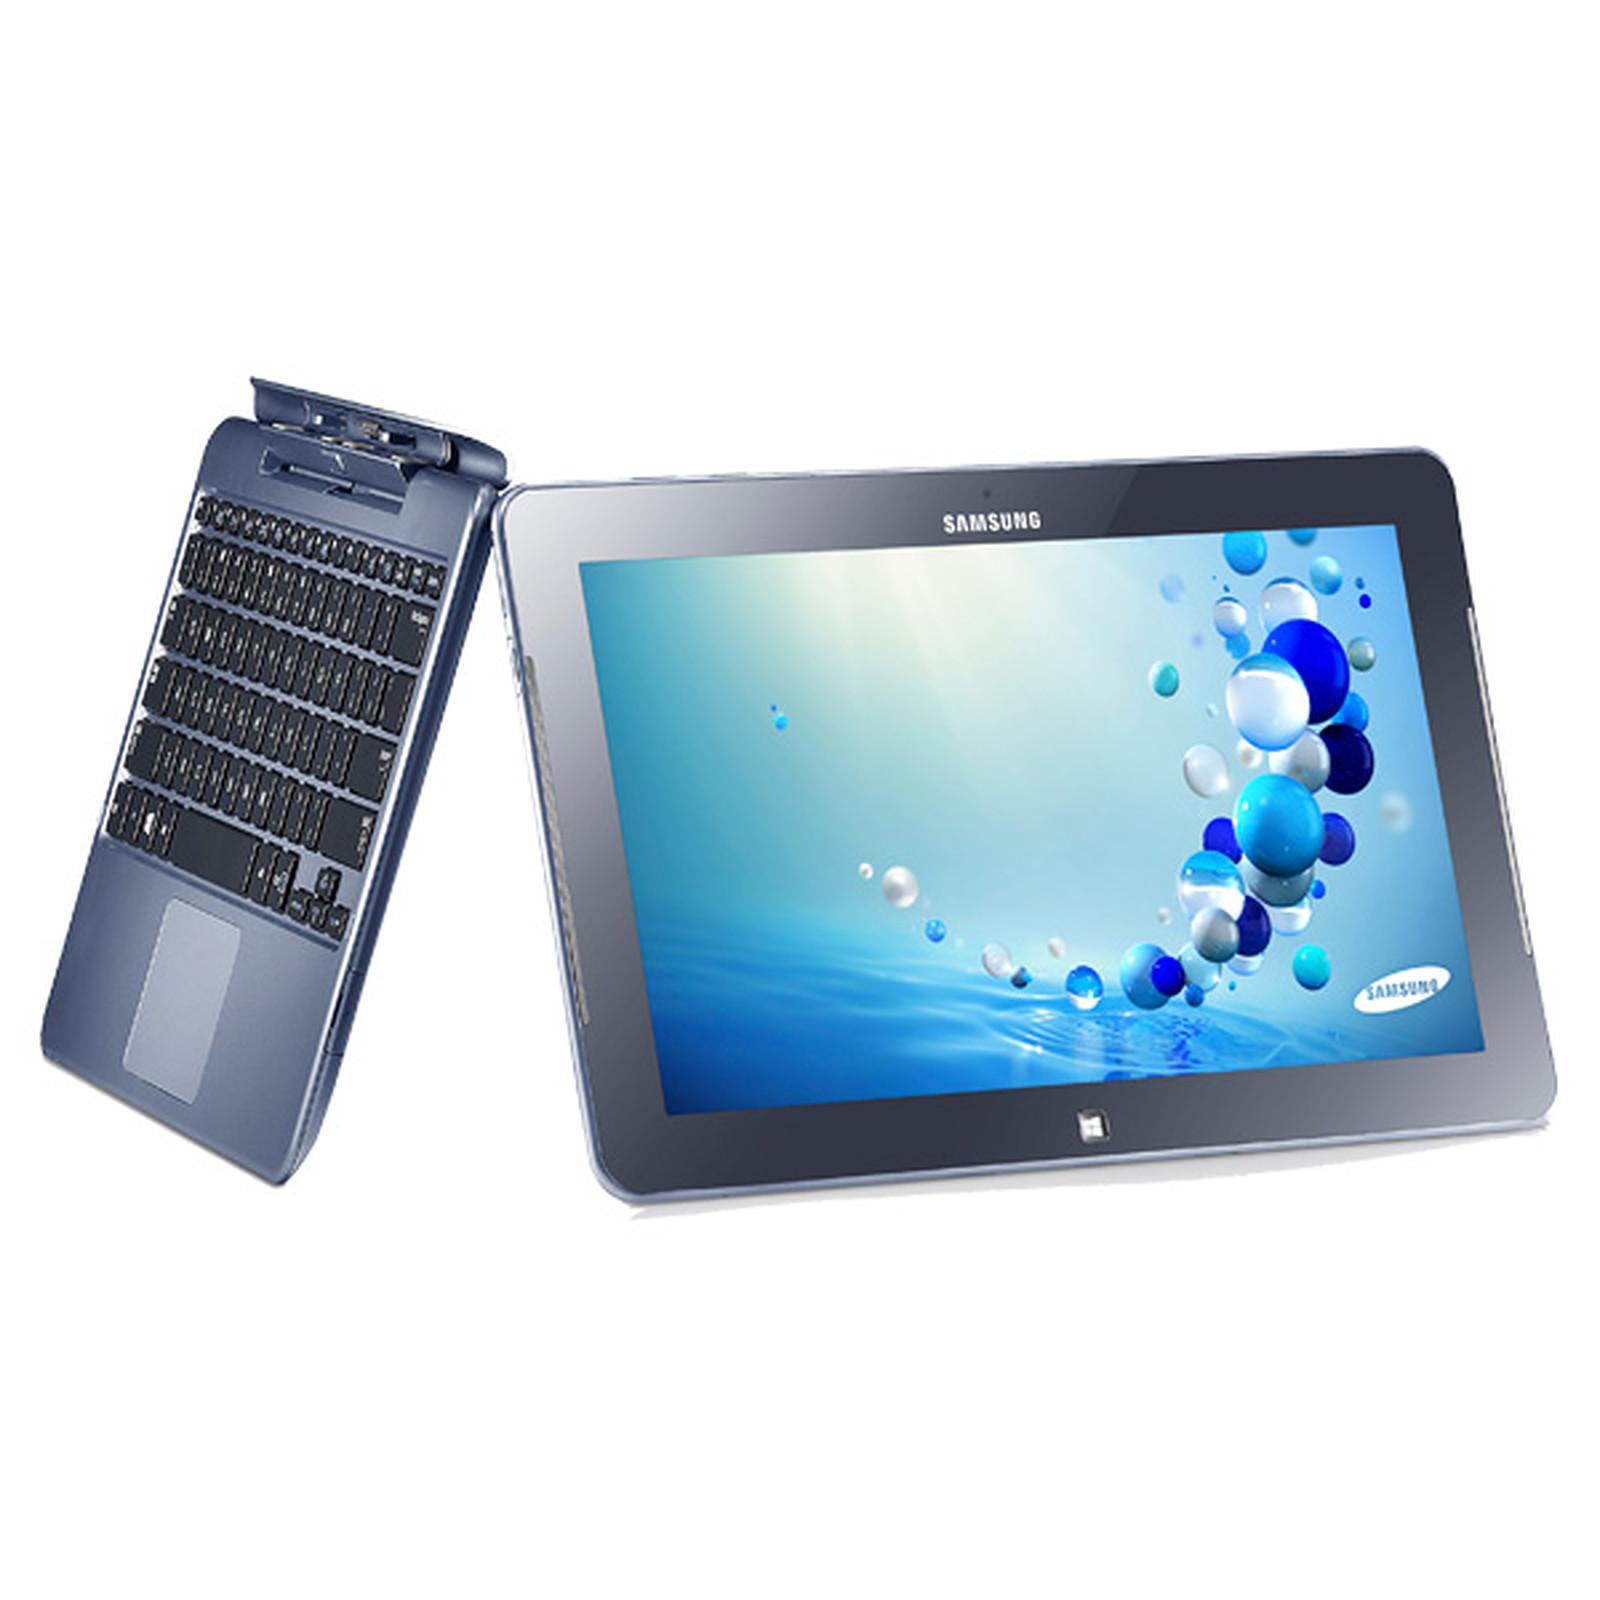 Samsung ATIV Smart PC 500T1C-A01FR